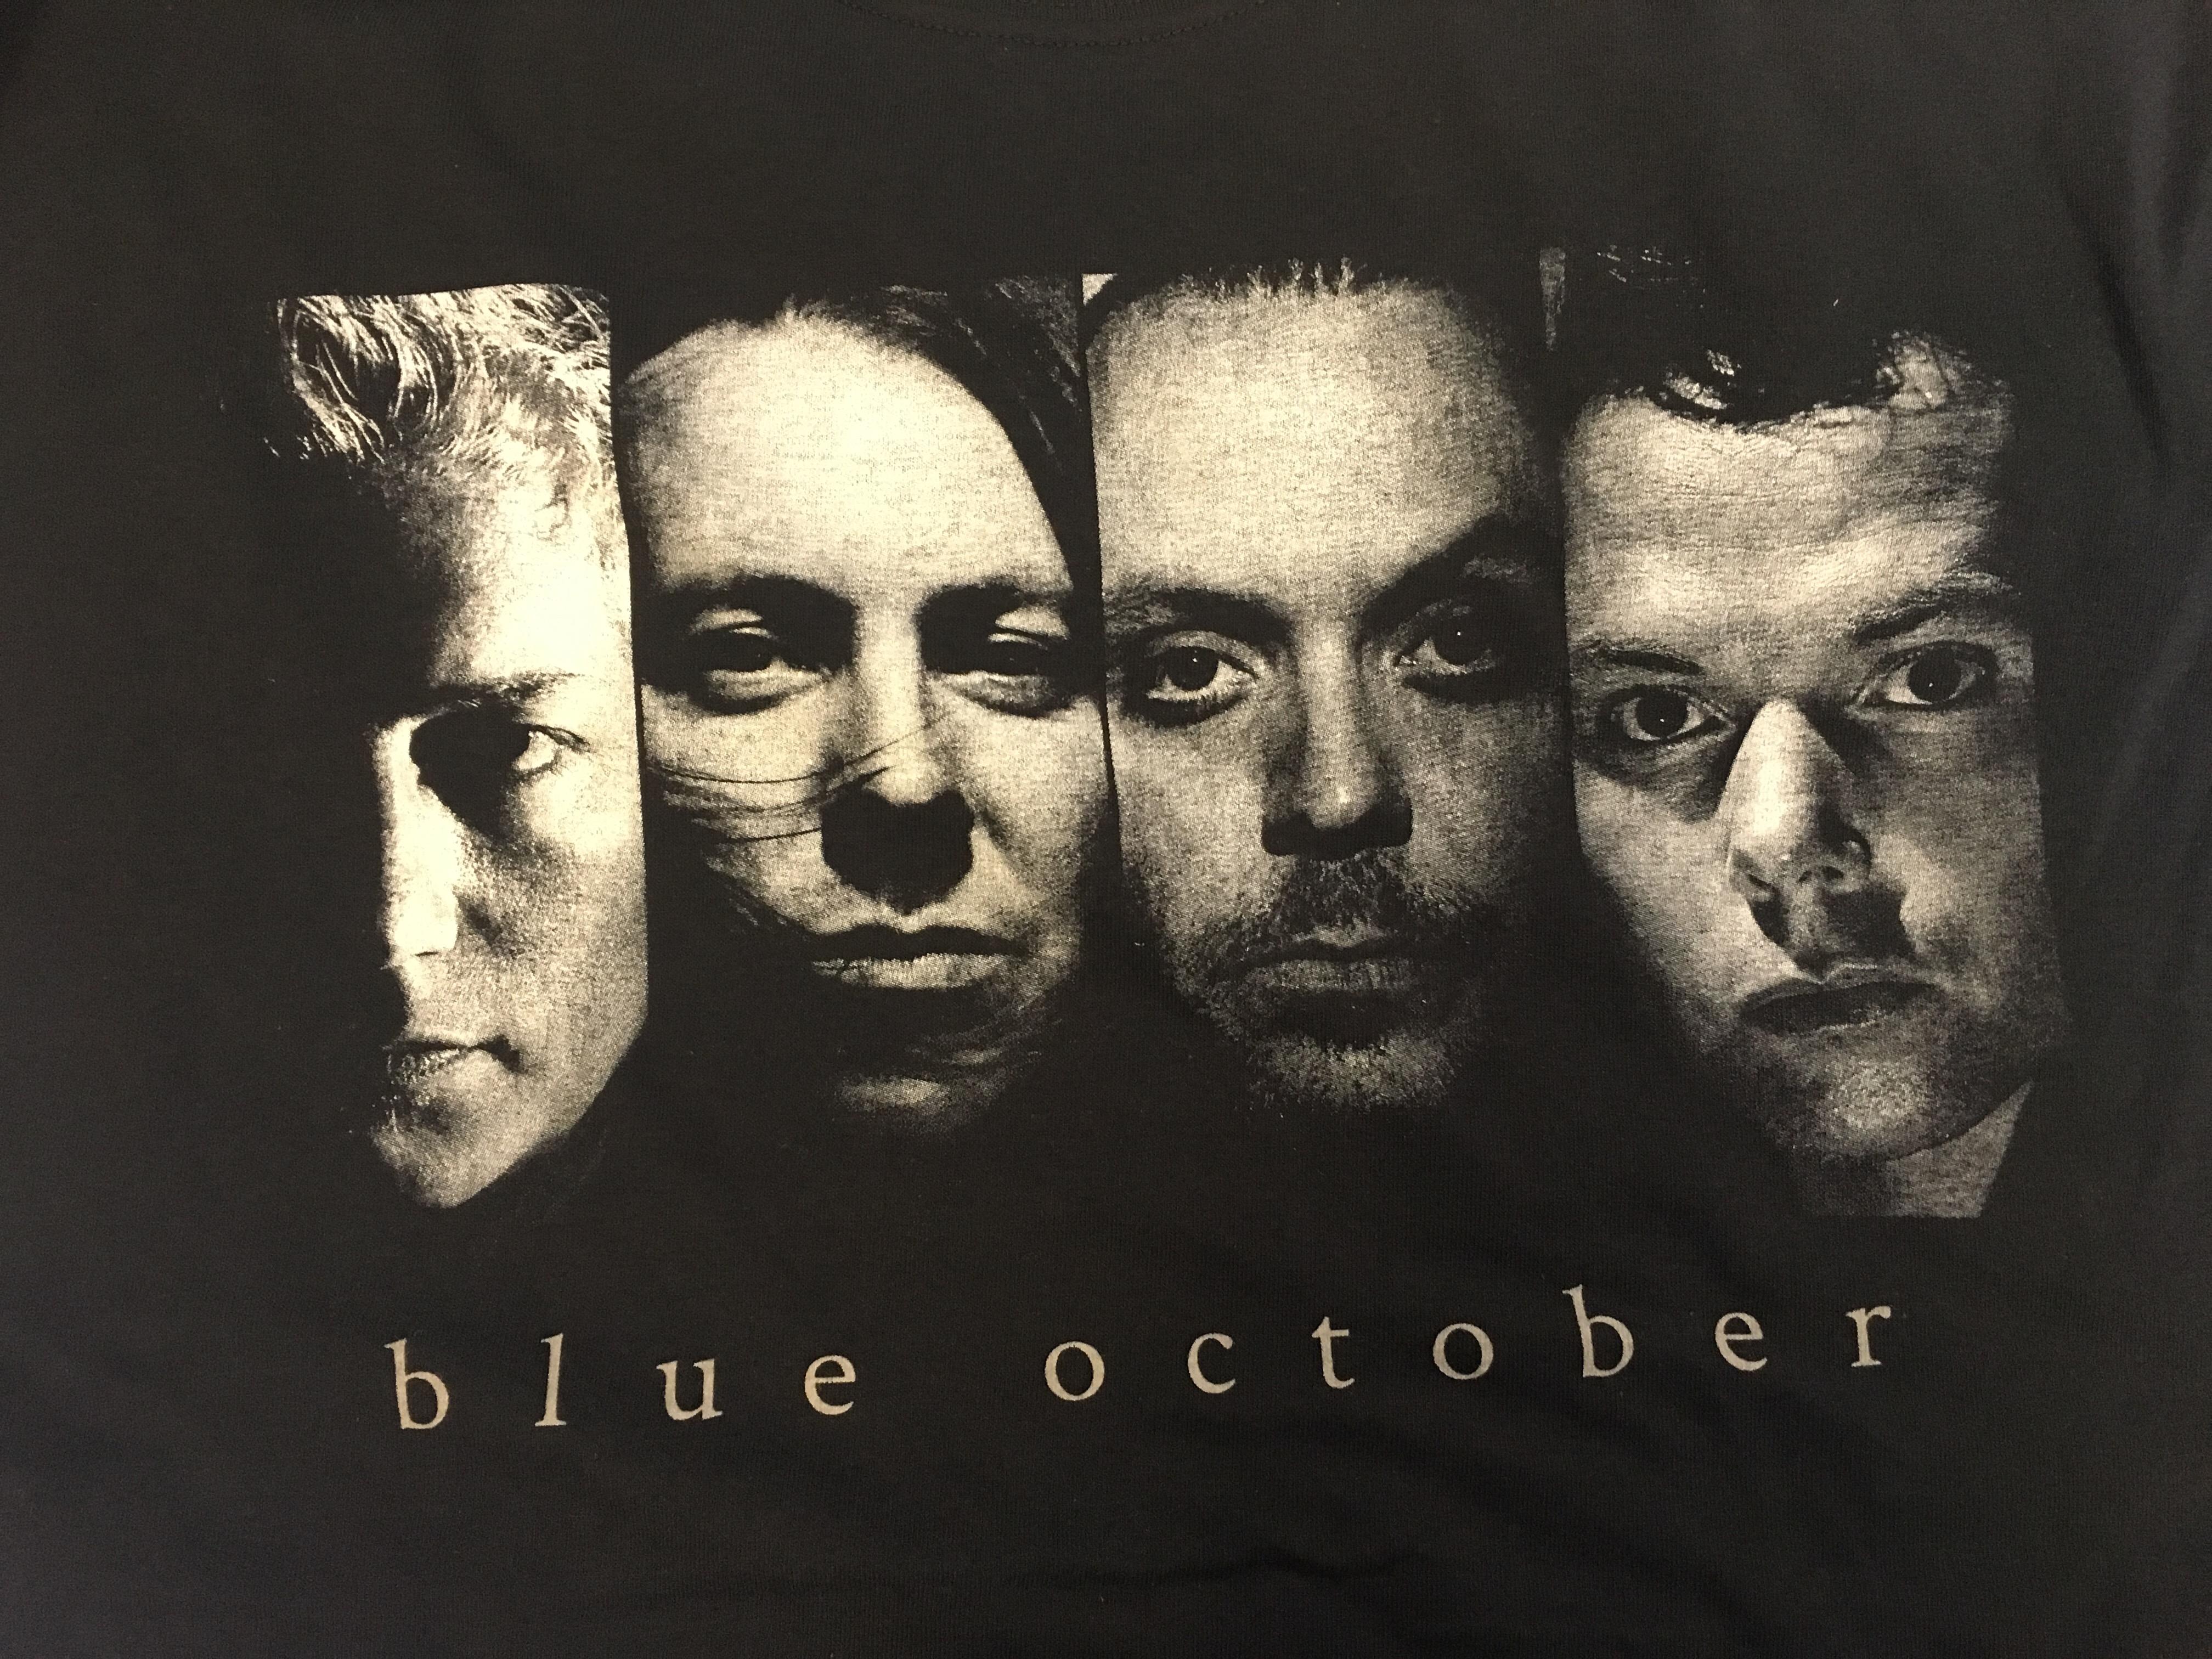 Band (Black Tee) - Blue October